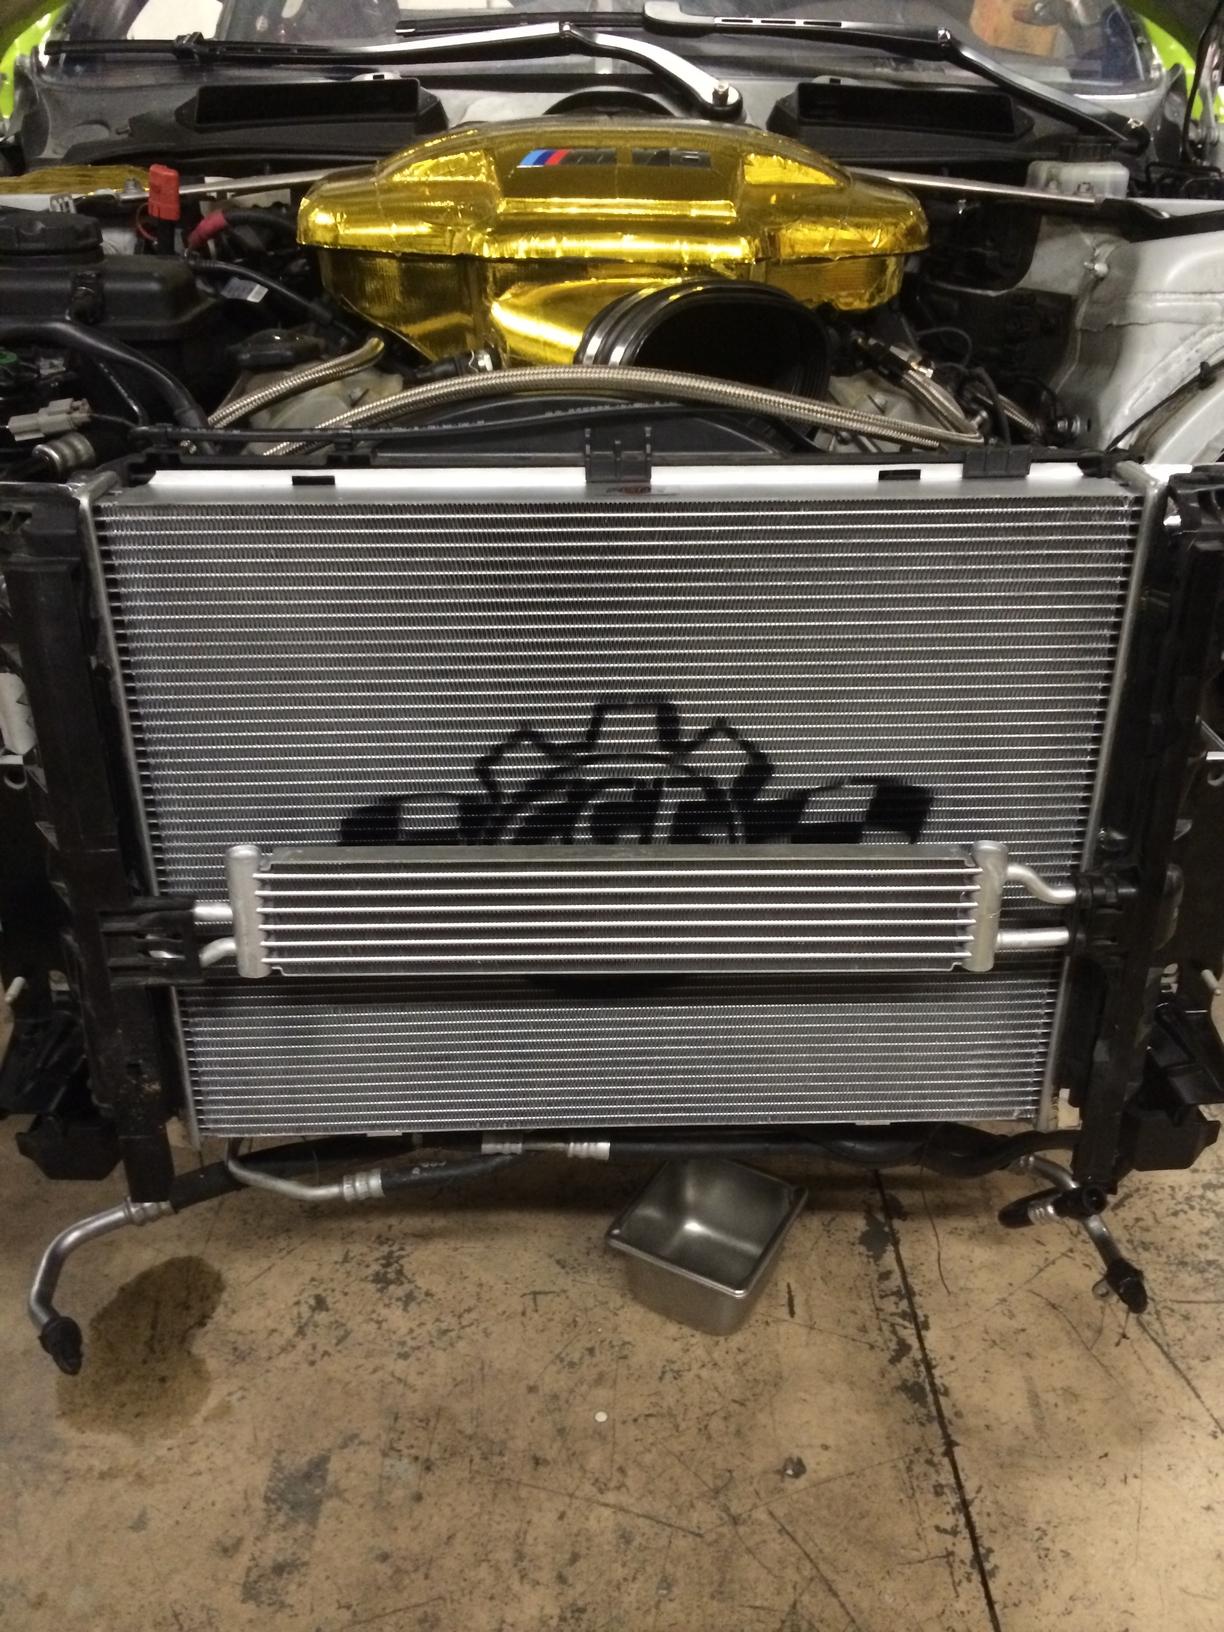 Csf Power Steering Cooler E9x M3 Hack Engineeringhack